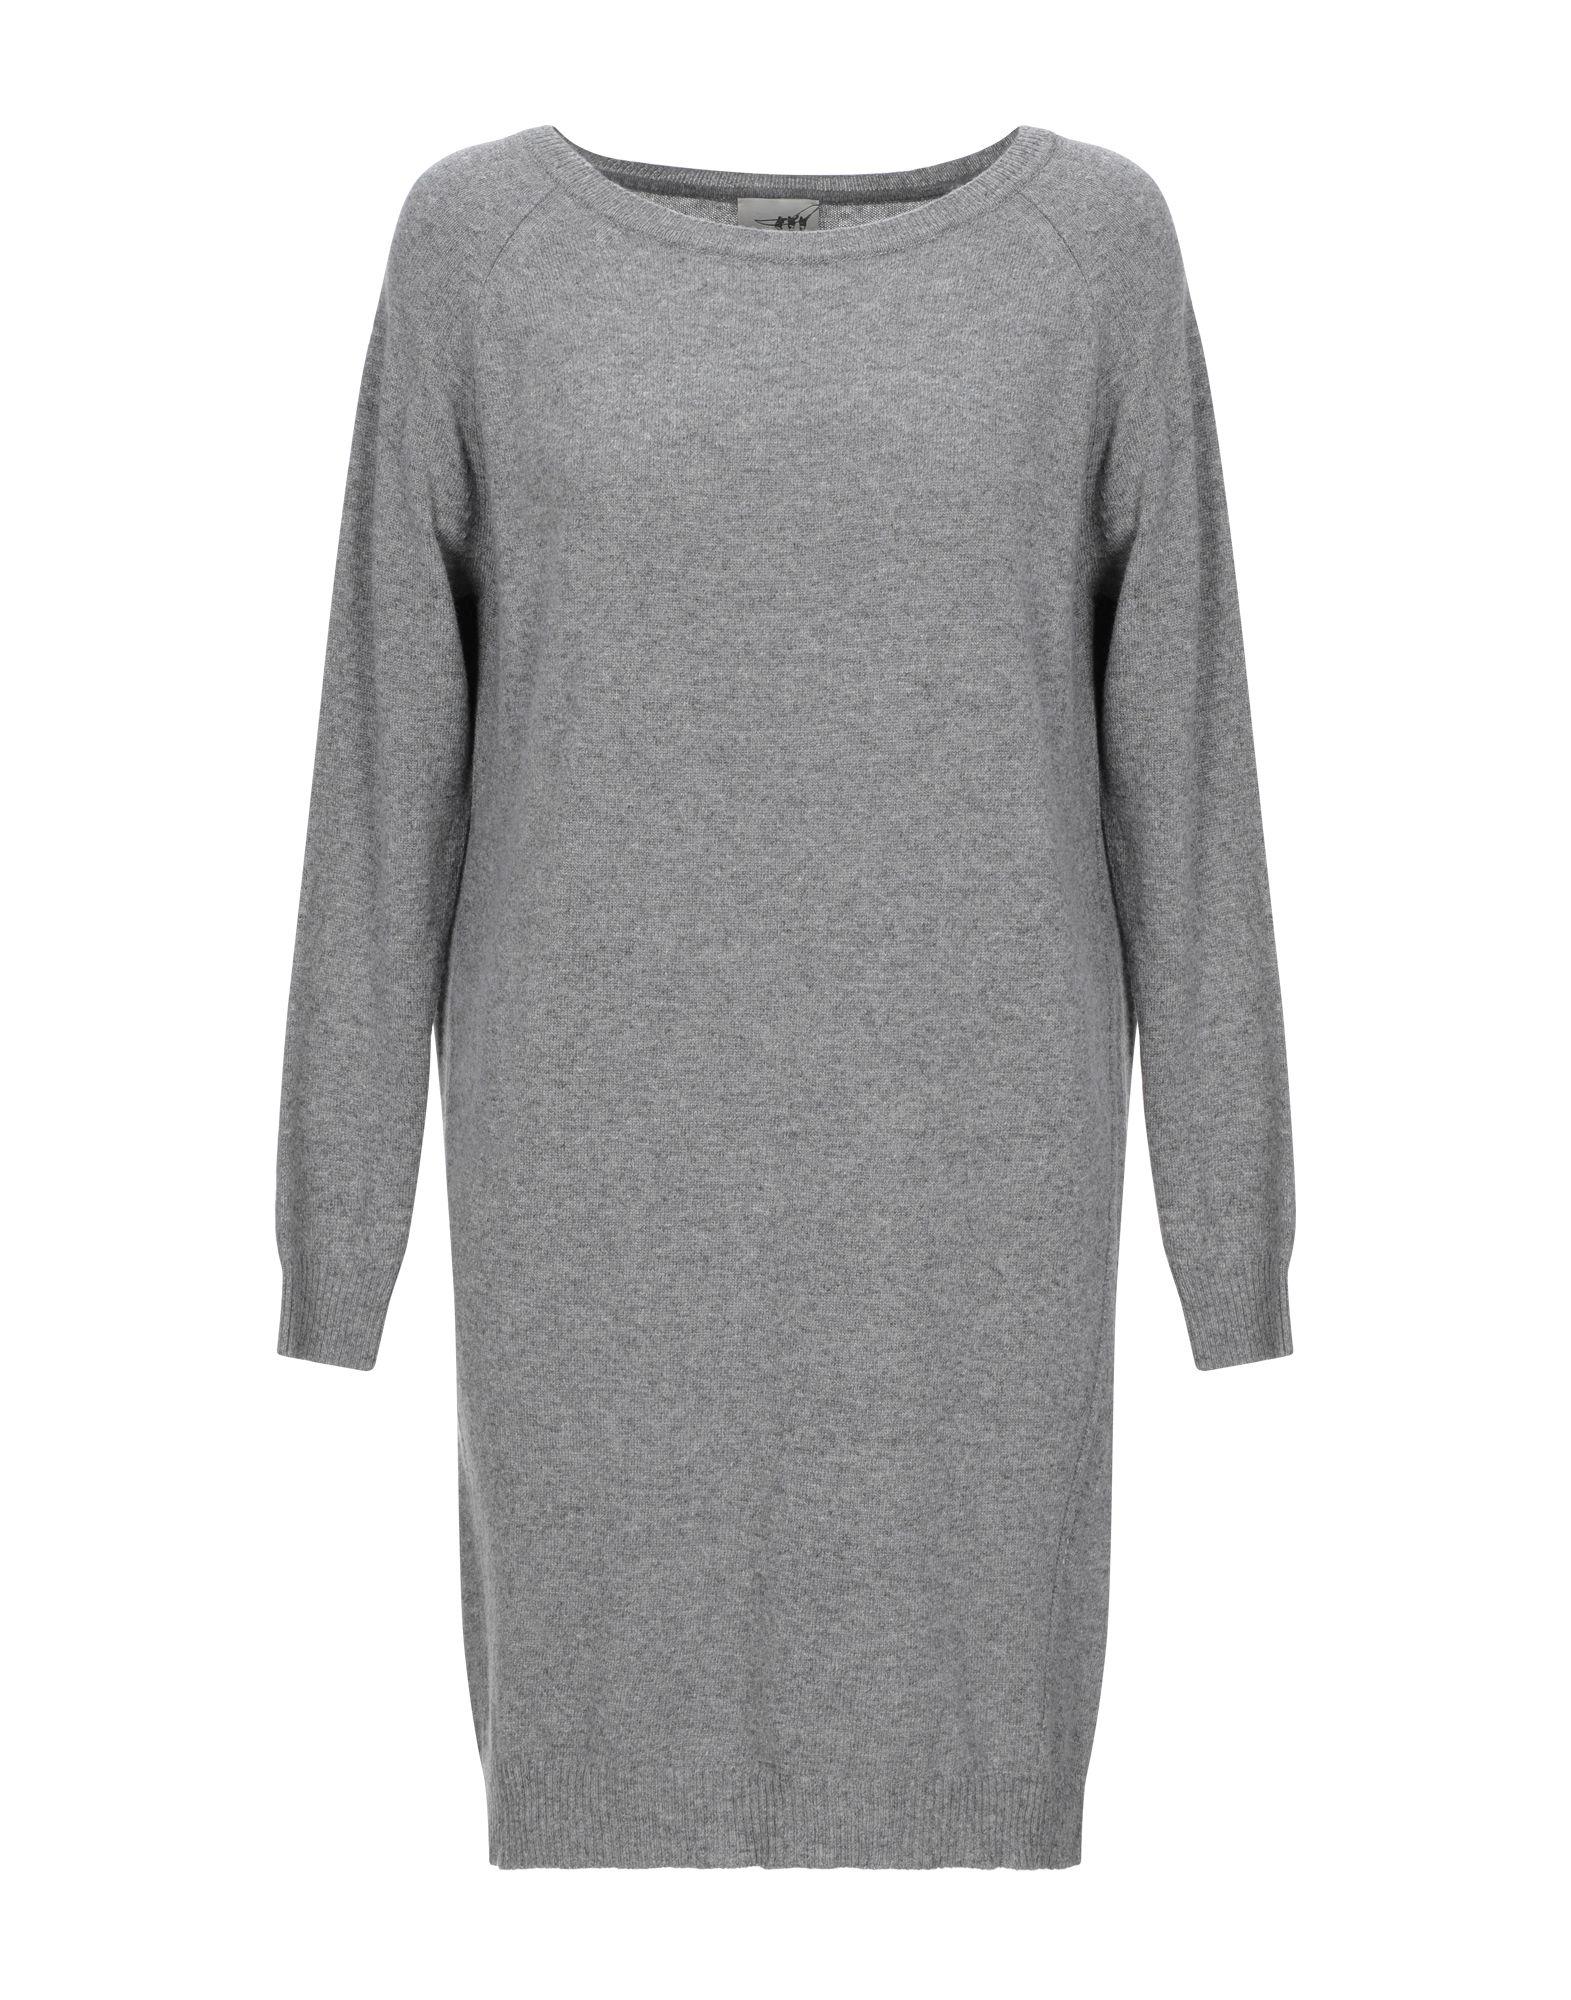 HENRY COTTON'S Короткое платье